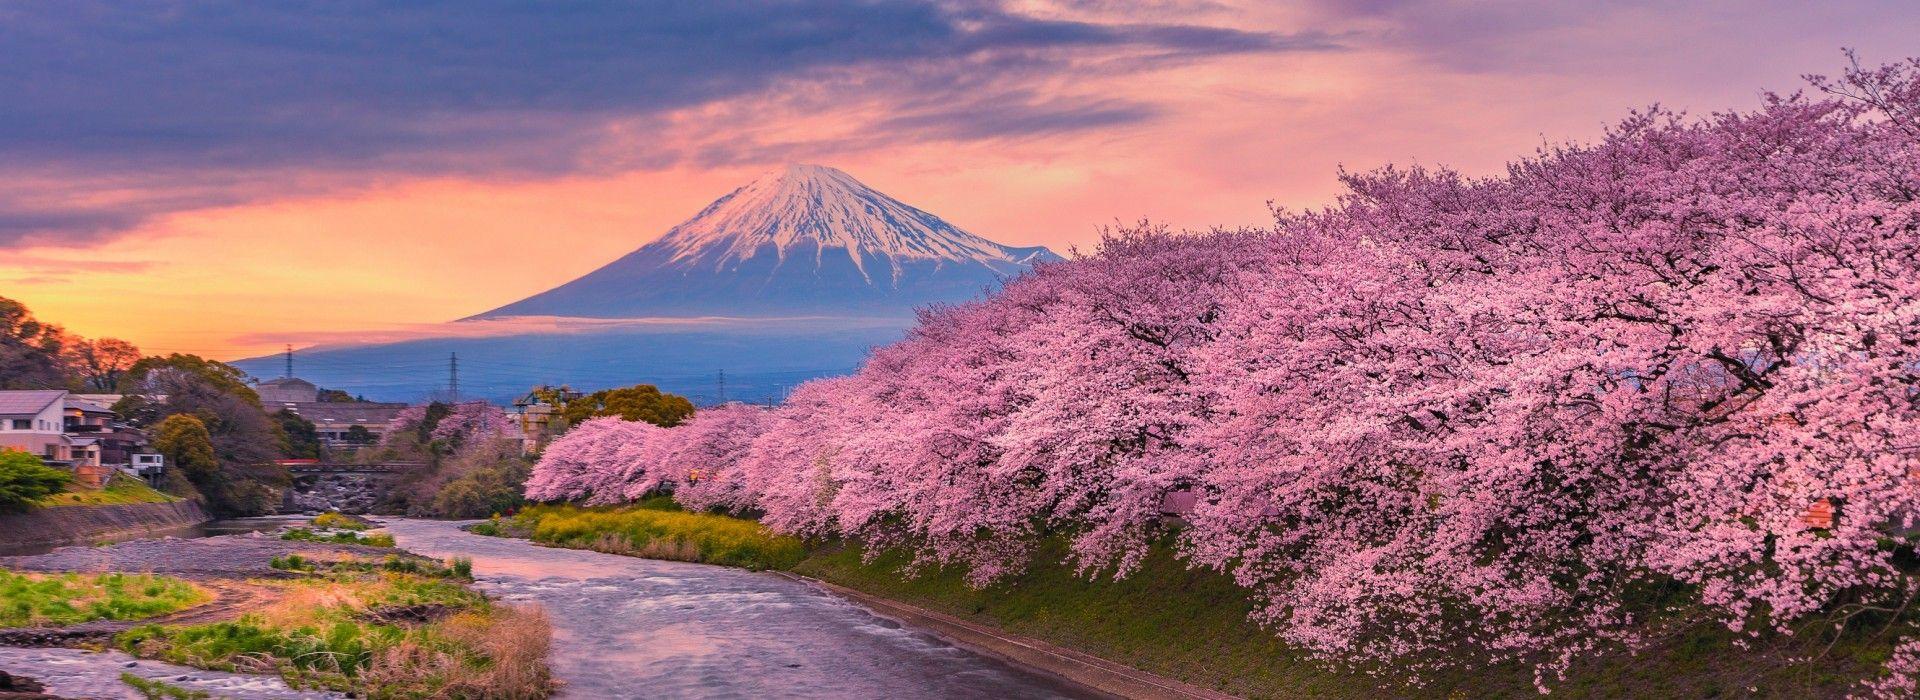 Adventure and sport activities Tours in Japan